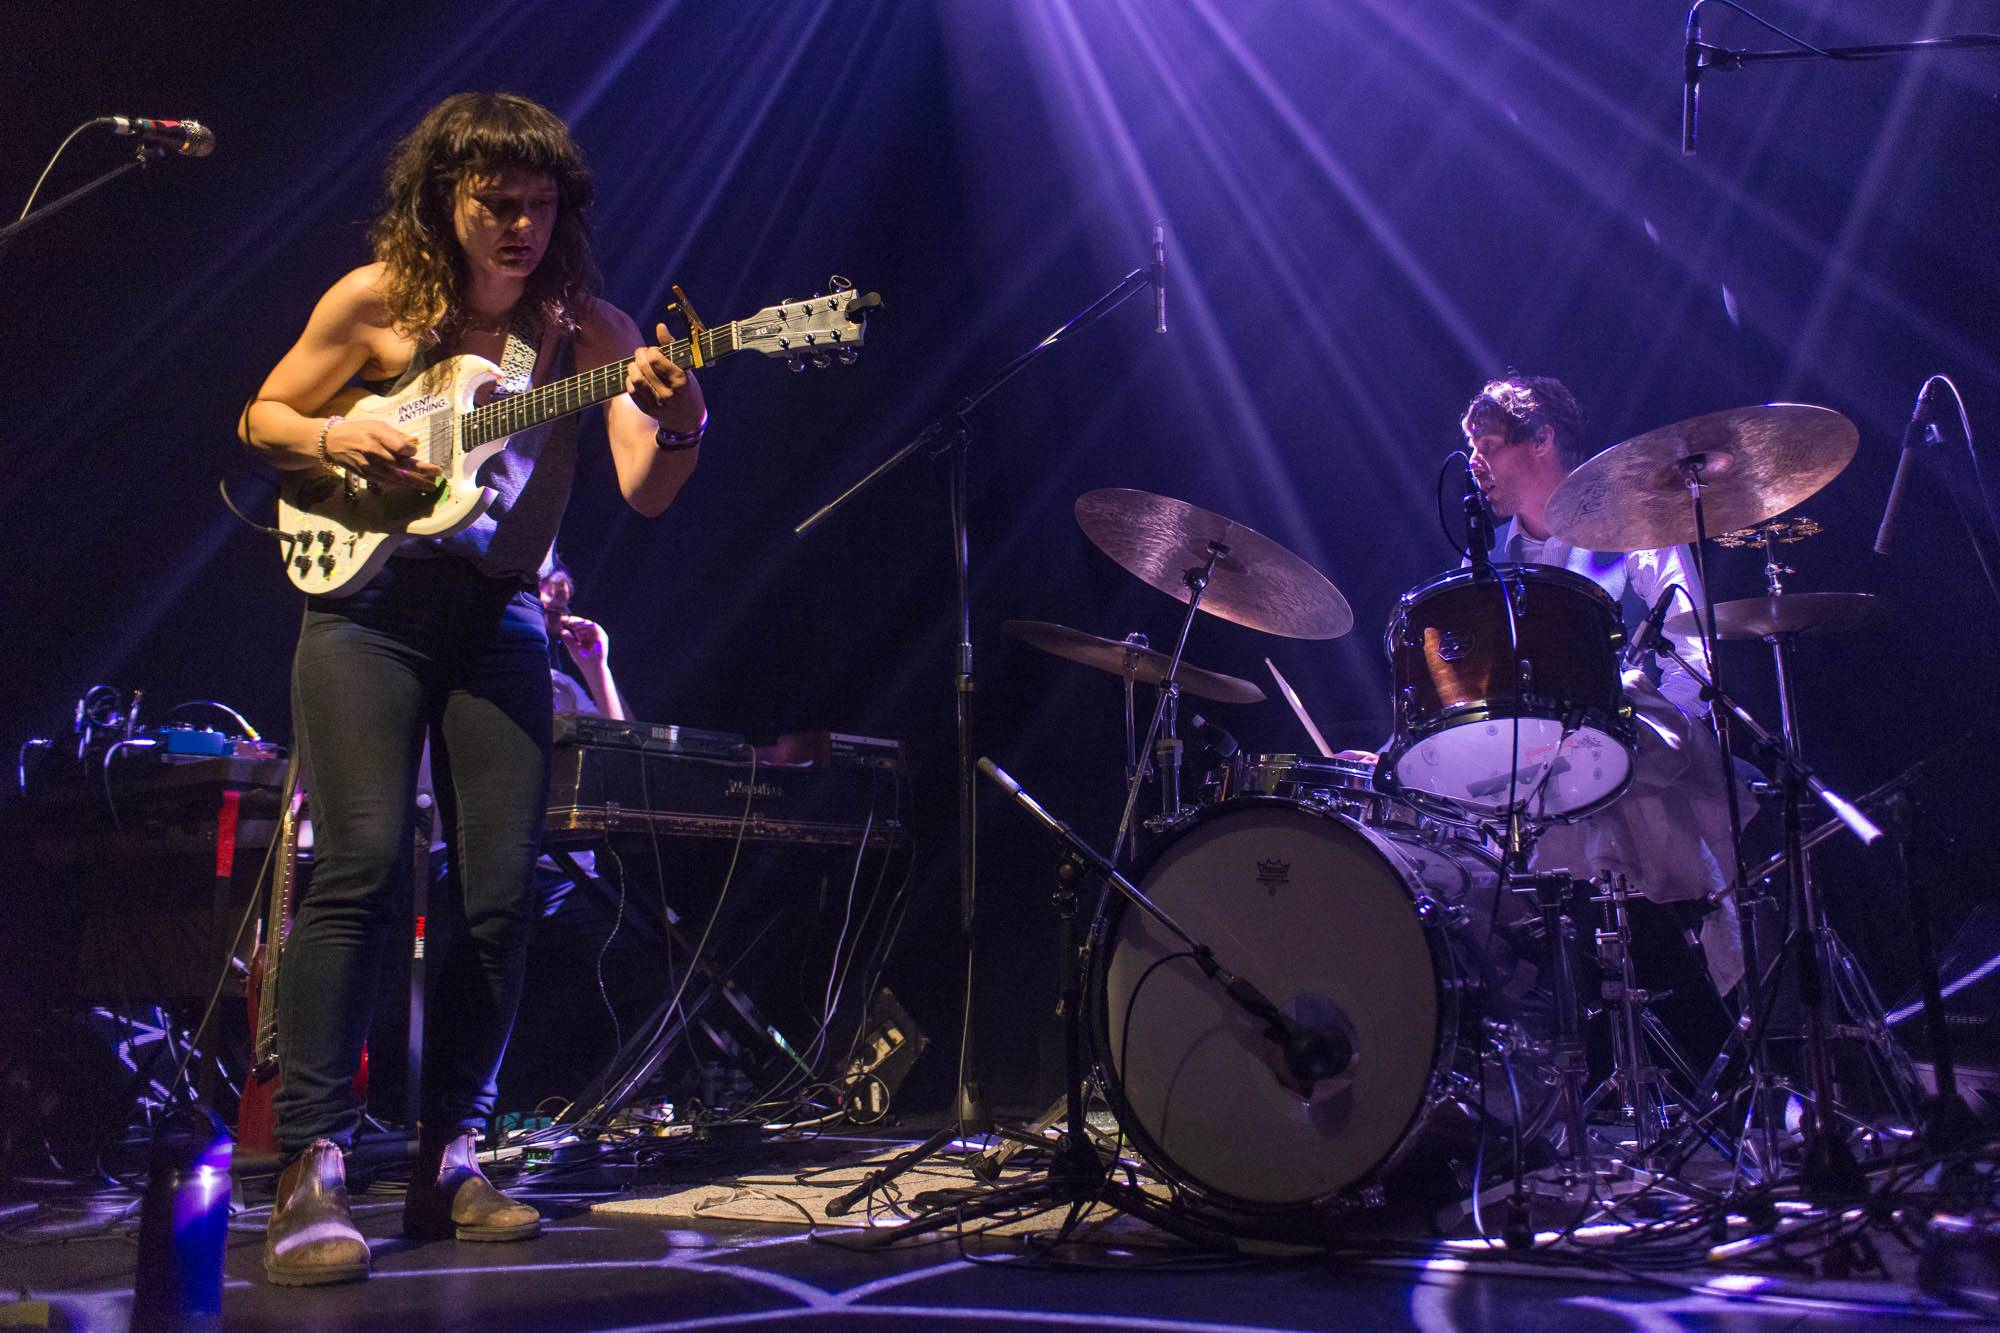 Land of Talk at the Imperial Theatre, Vancouver, June 26 2017. Jessica Vandergulik photo.